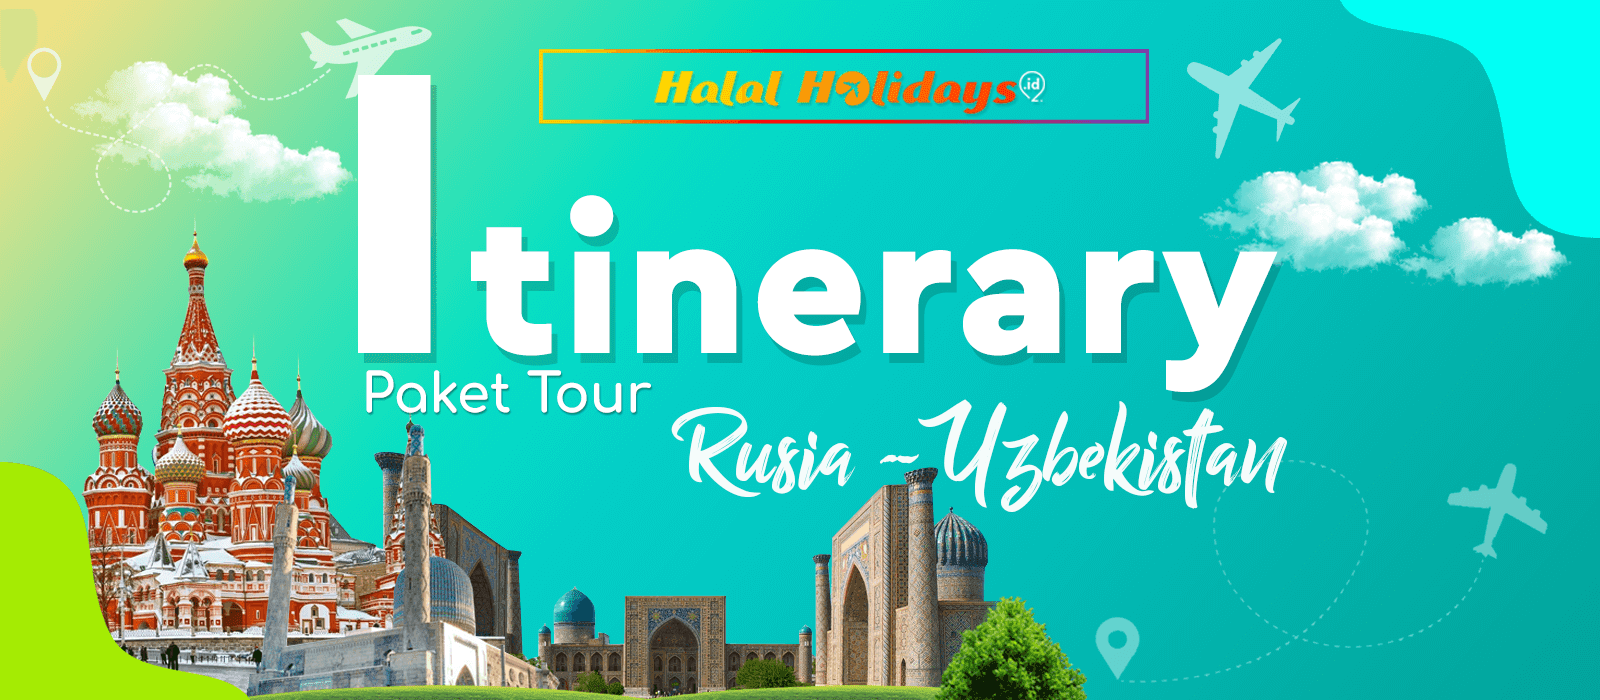 Itinerary Paket Tour Rusia Uzbekistan 2020 10 Hari